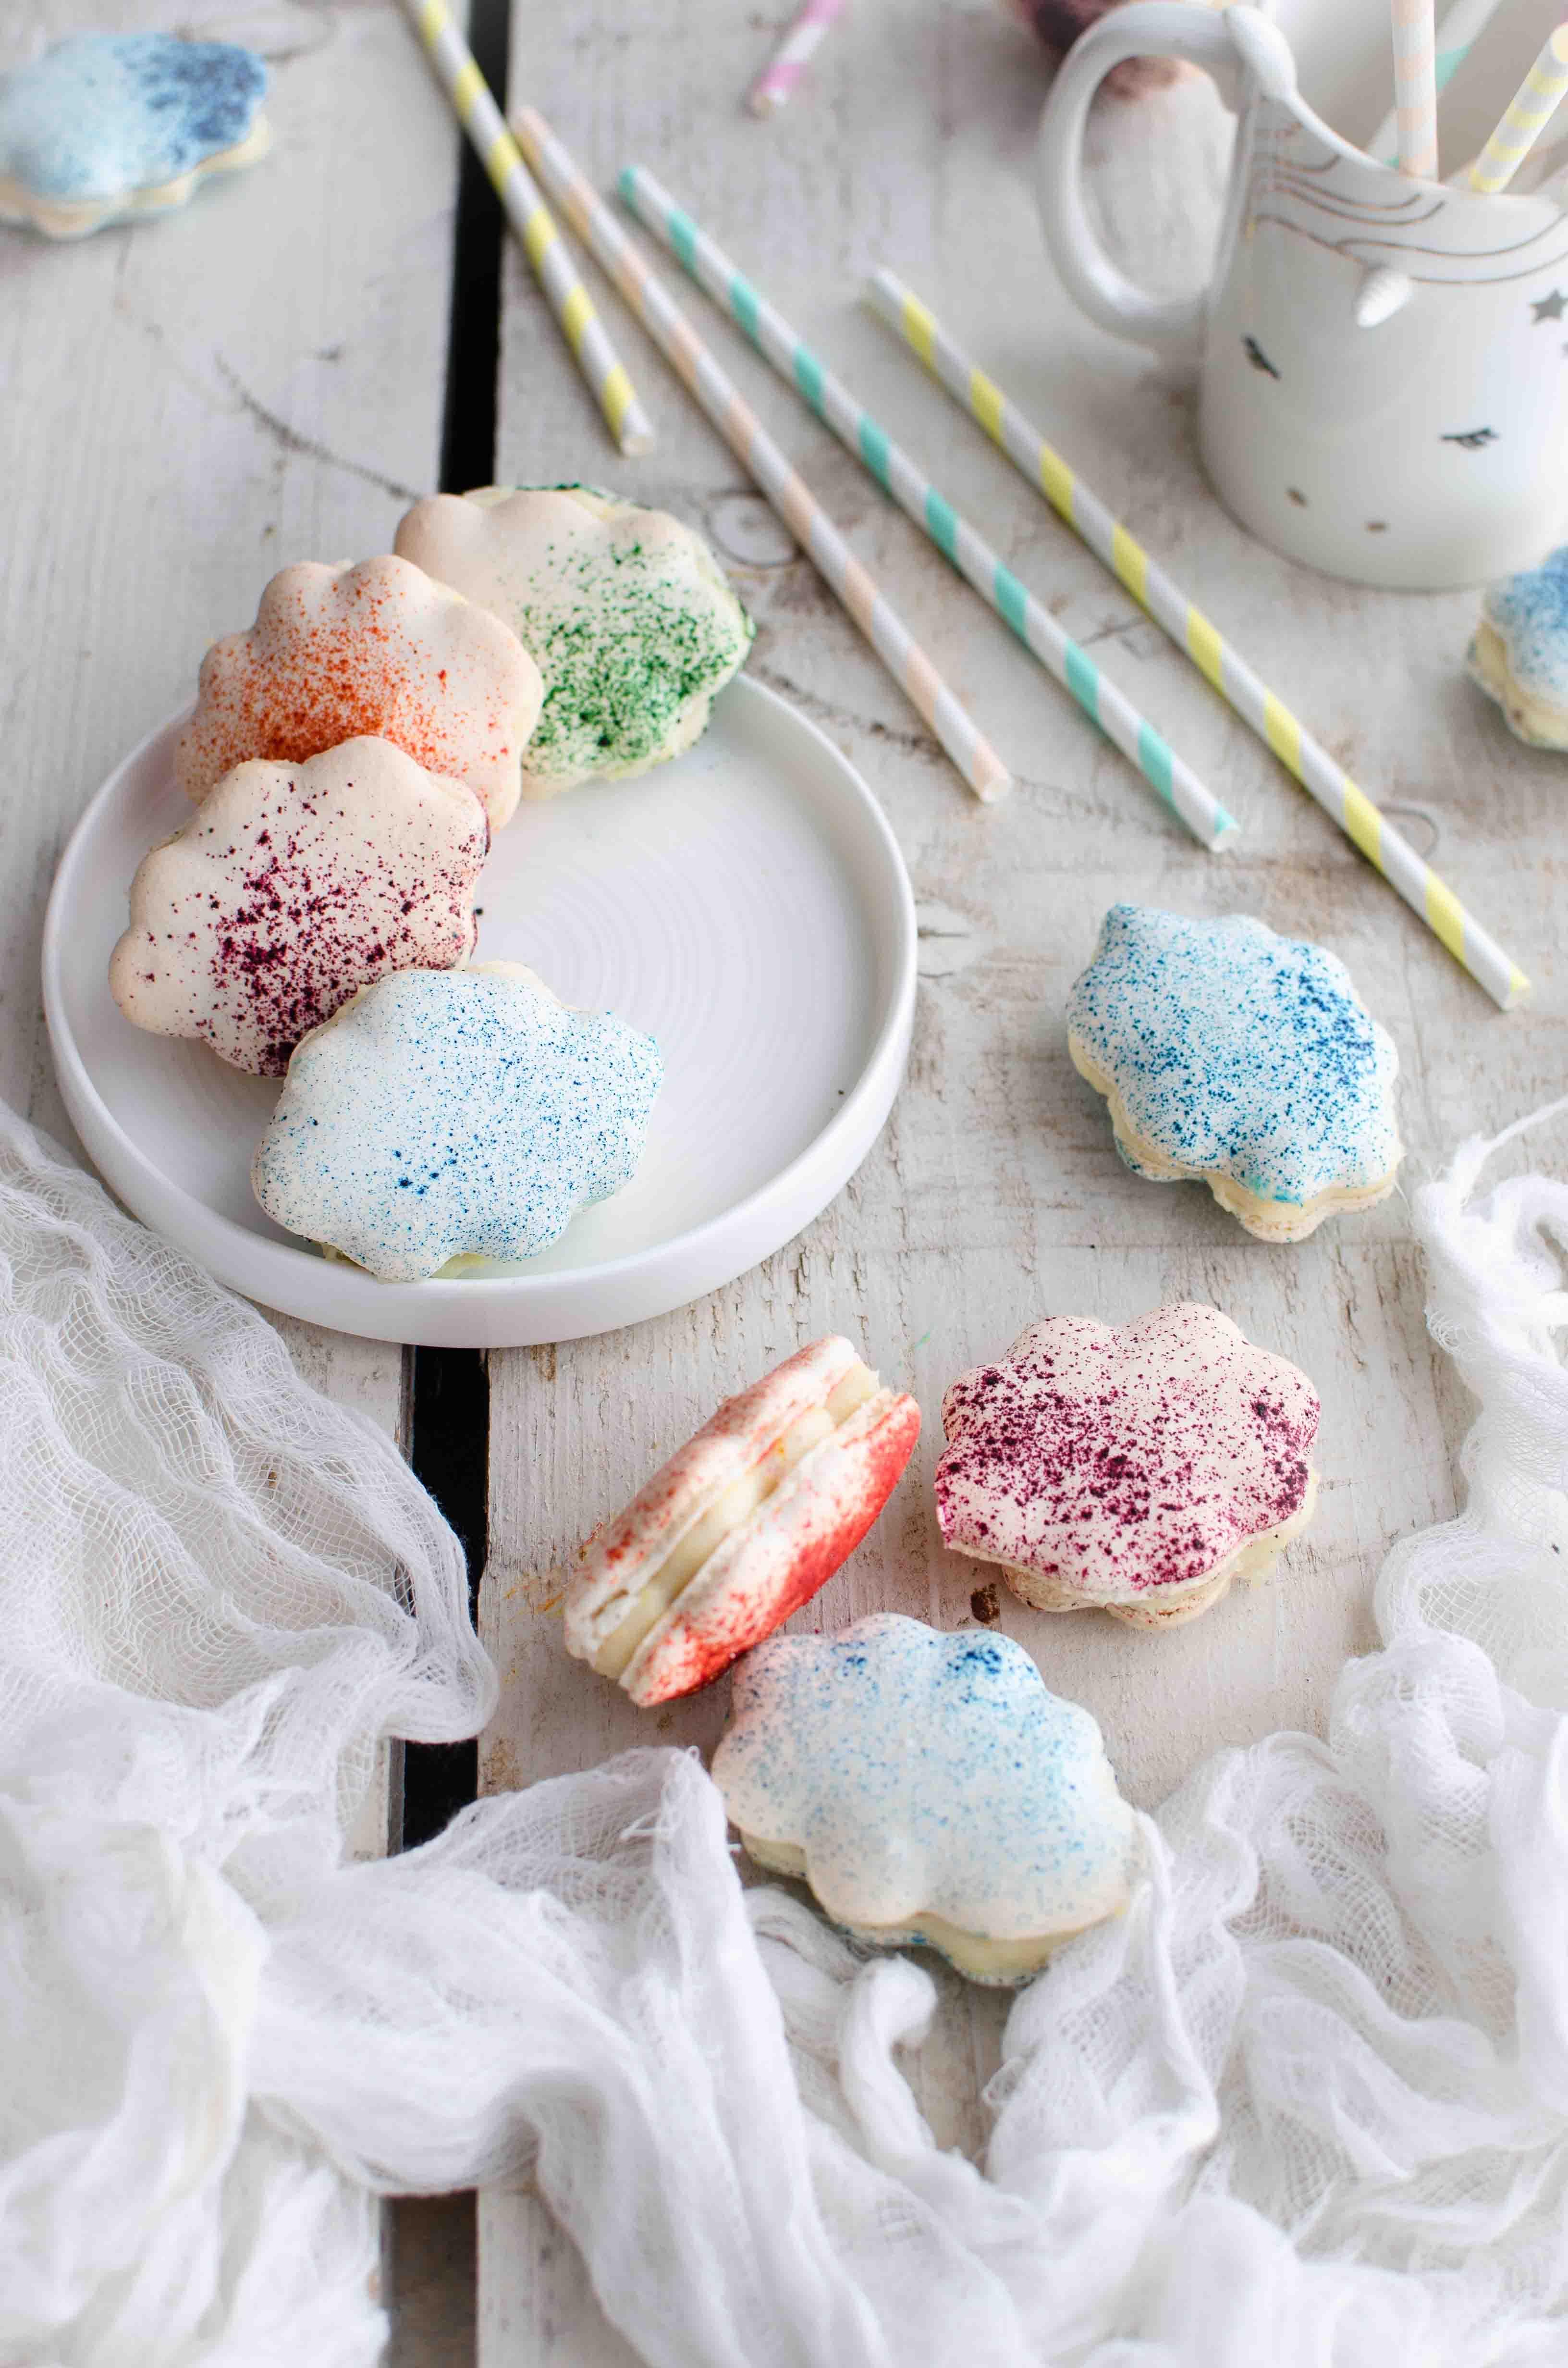 macarons-rainbow Macarons nuvoletta al cioccolato bianco, lavanda e pesche